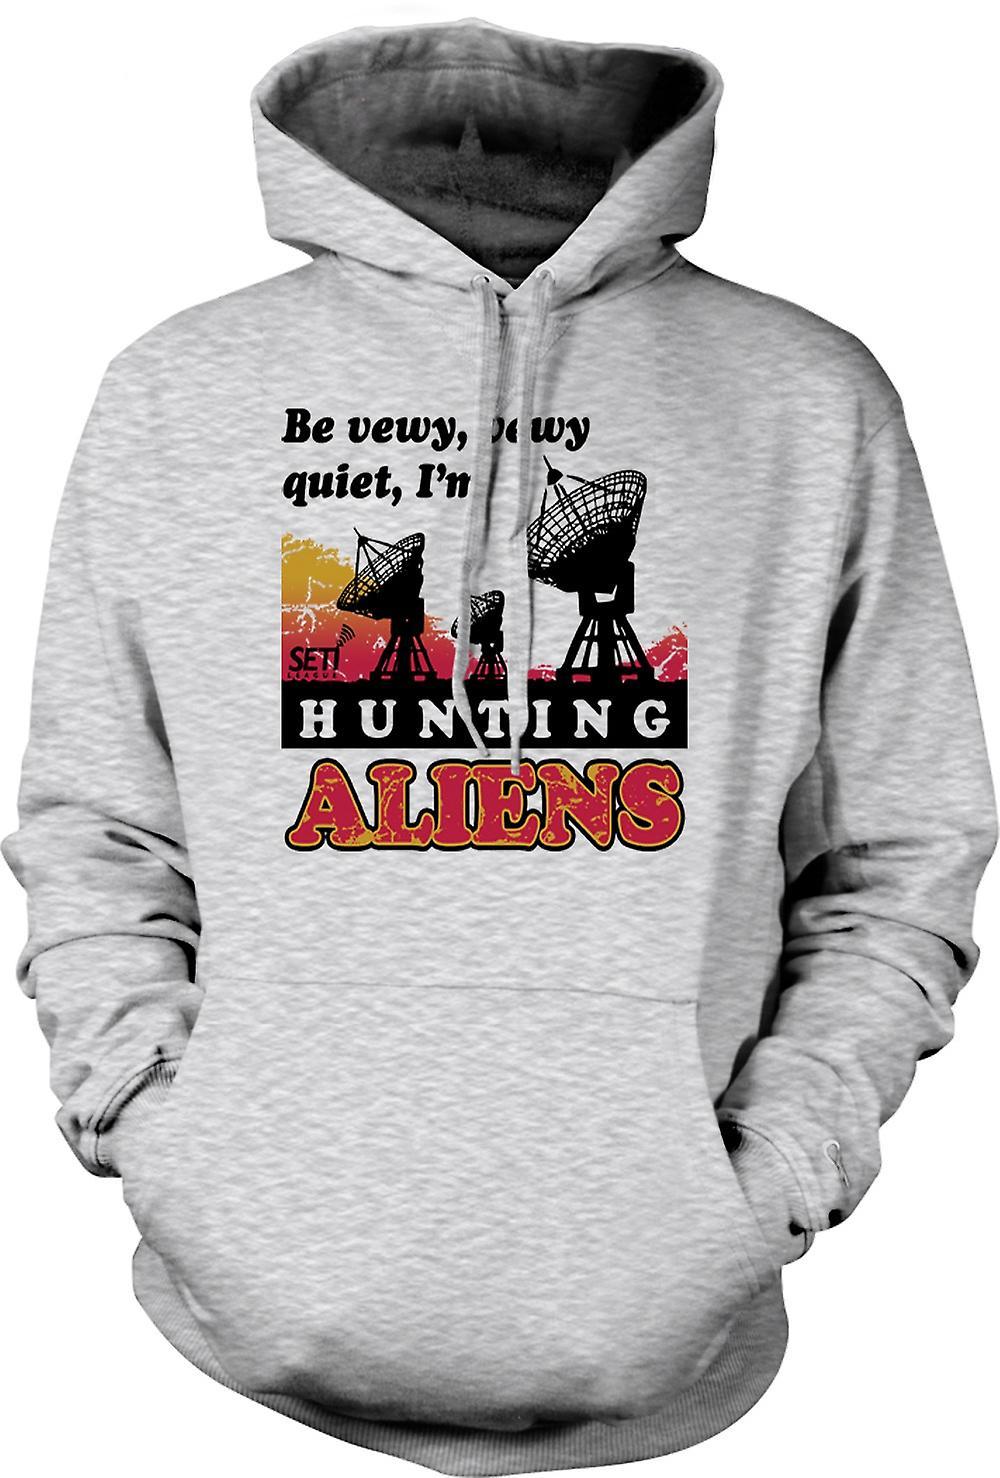 Mens Hoodie - SETI - UFO - Alien Hunters - Astronomy